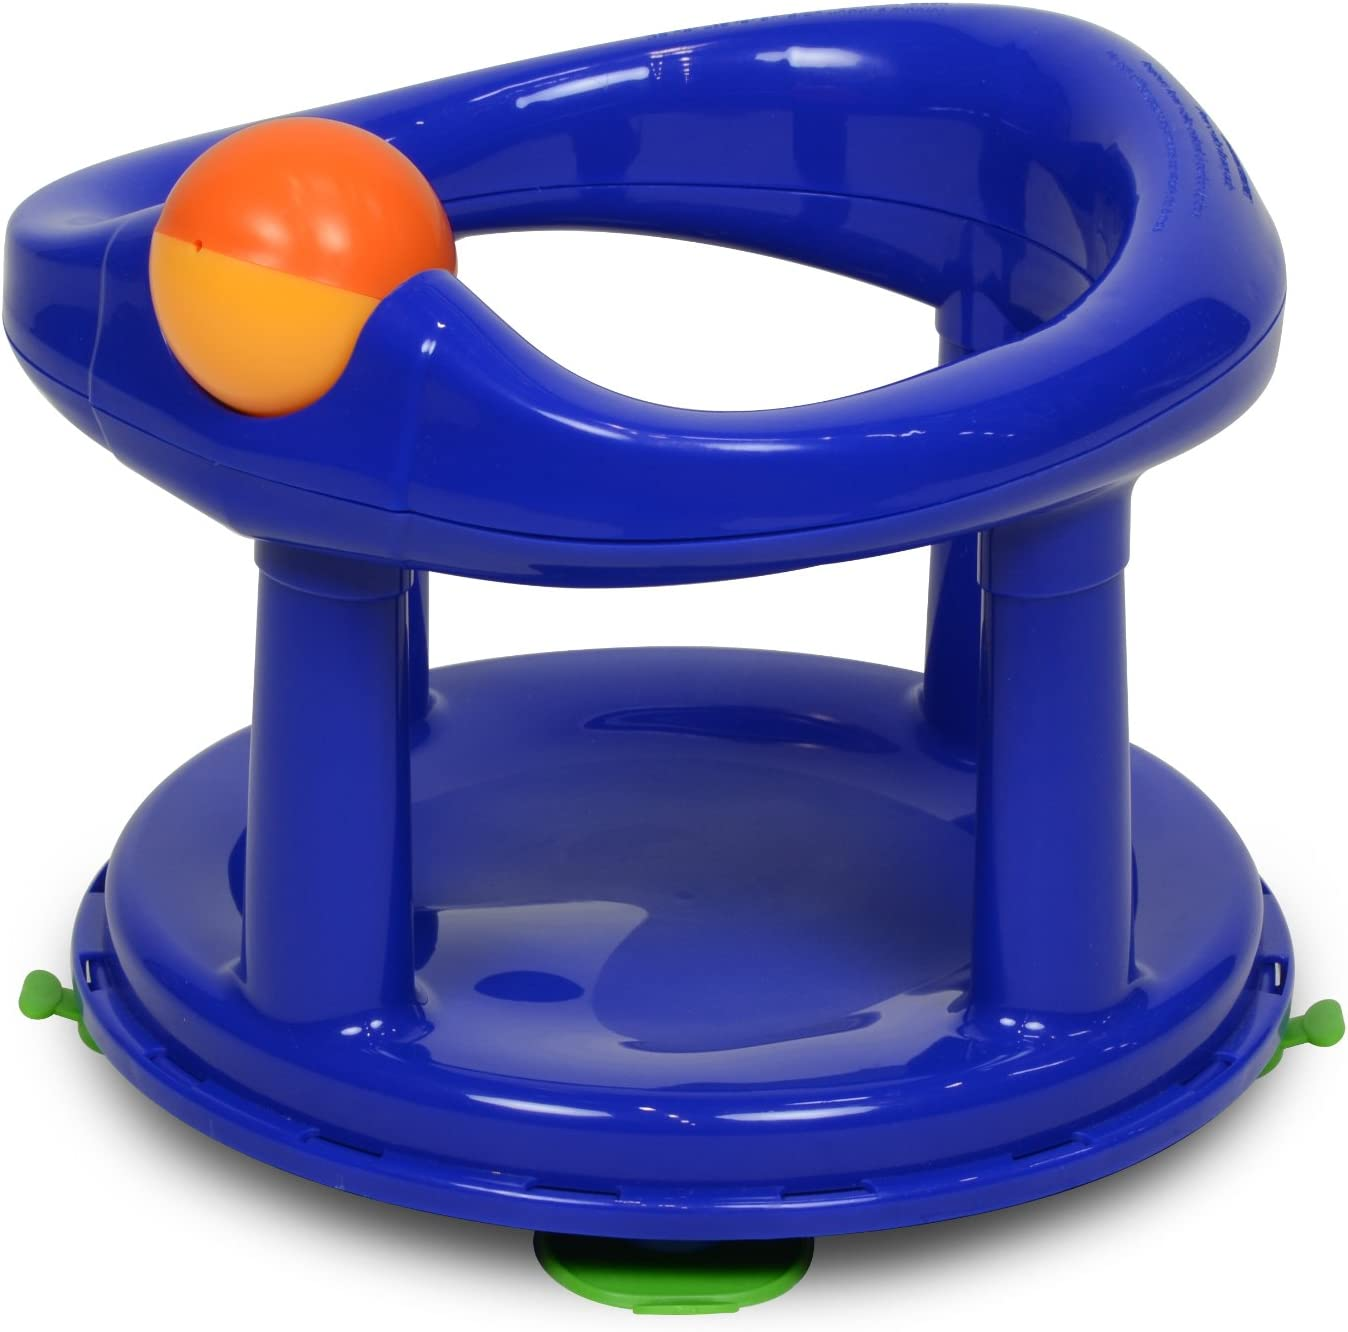 Safety 1st 37030760 - Bañera-asiento de baño